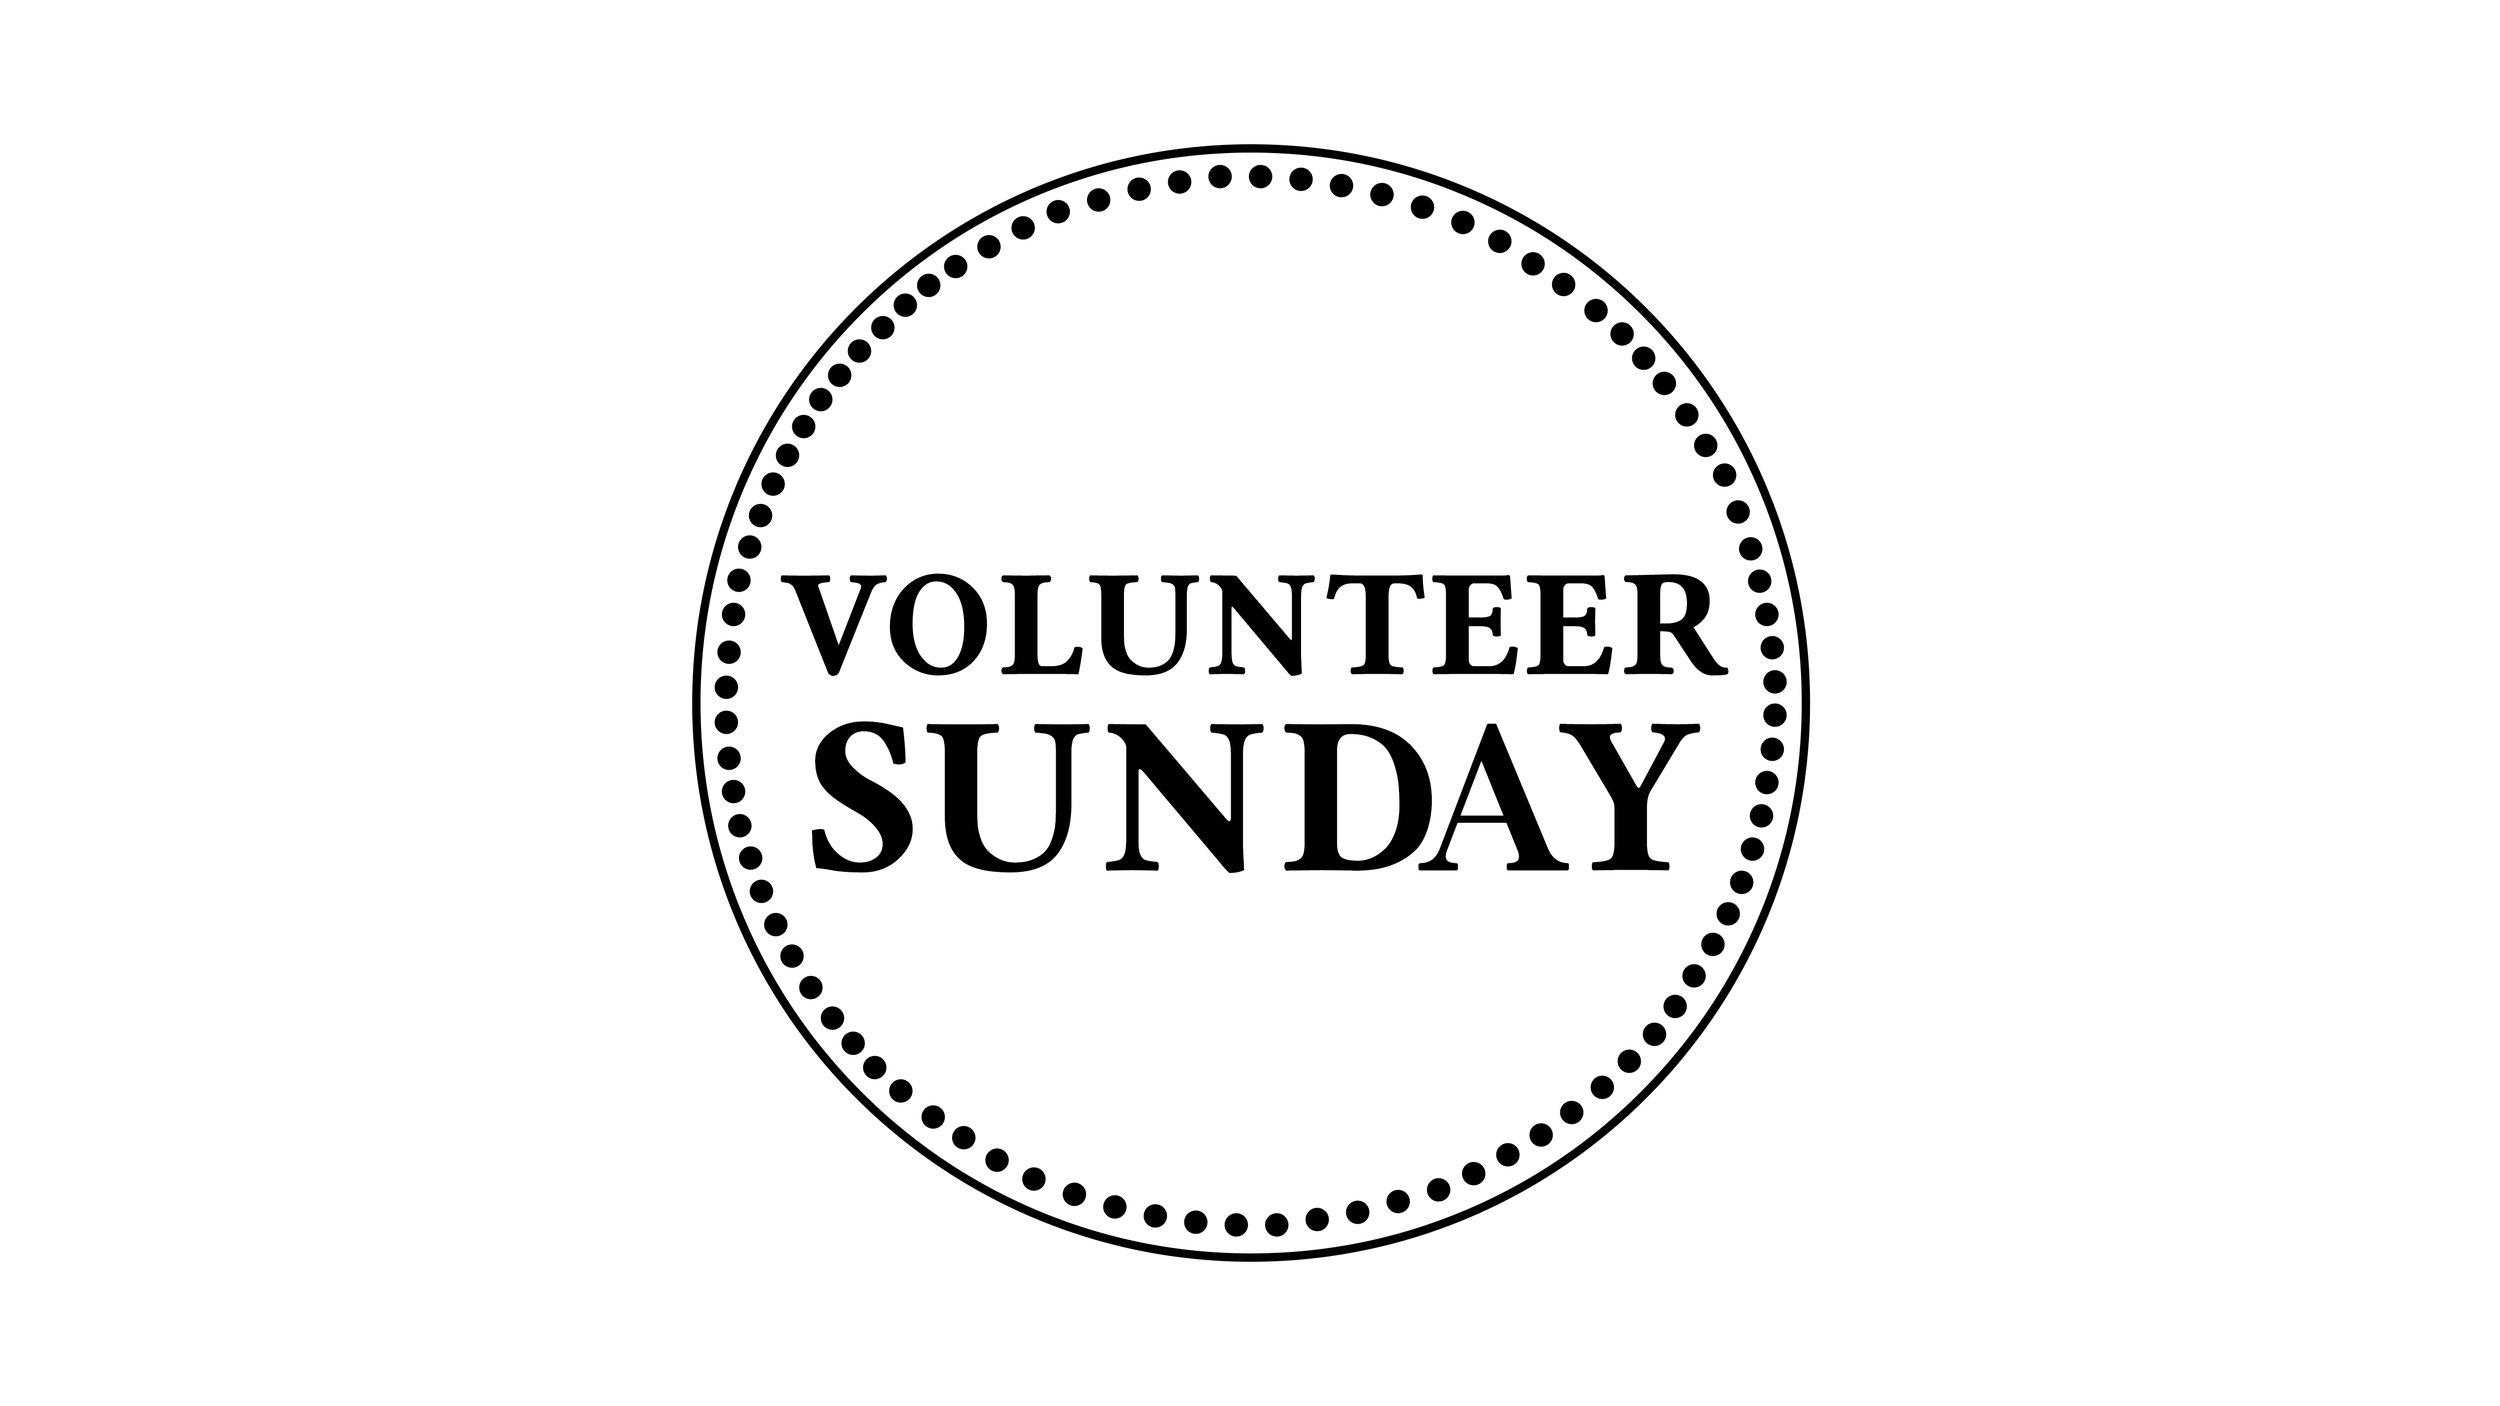 Volunteer Sunday.jpg